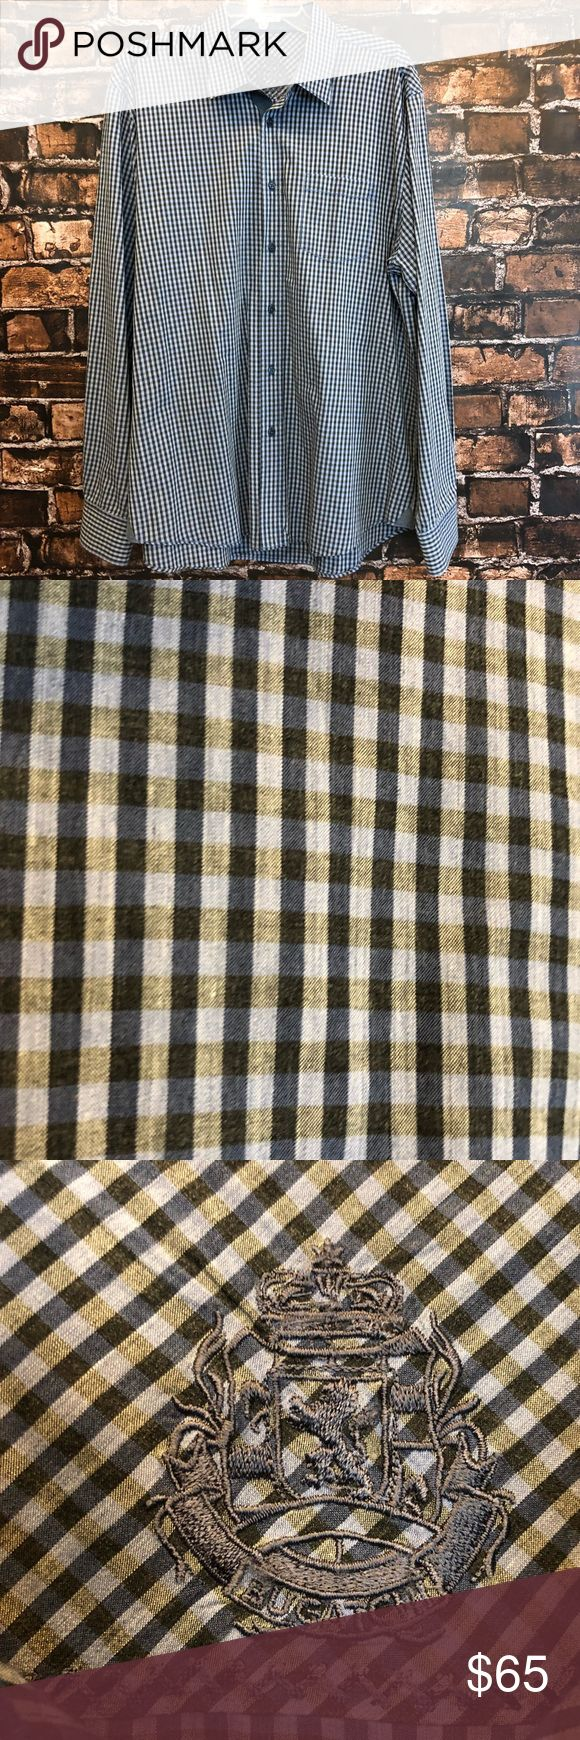 Men's L Bugatchi blue plaid button down Very nice blue plaid button down! Shaped fit. Bugatchi size Large!! In good condition!! (MT384) Bugatchi Shirts